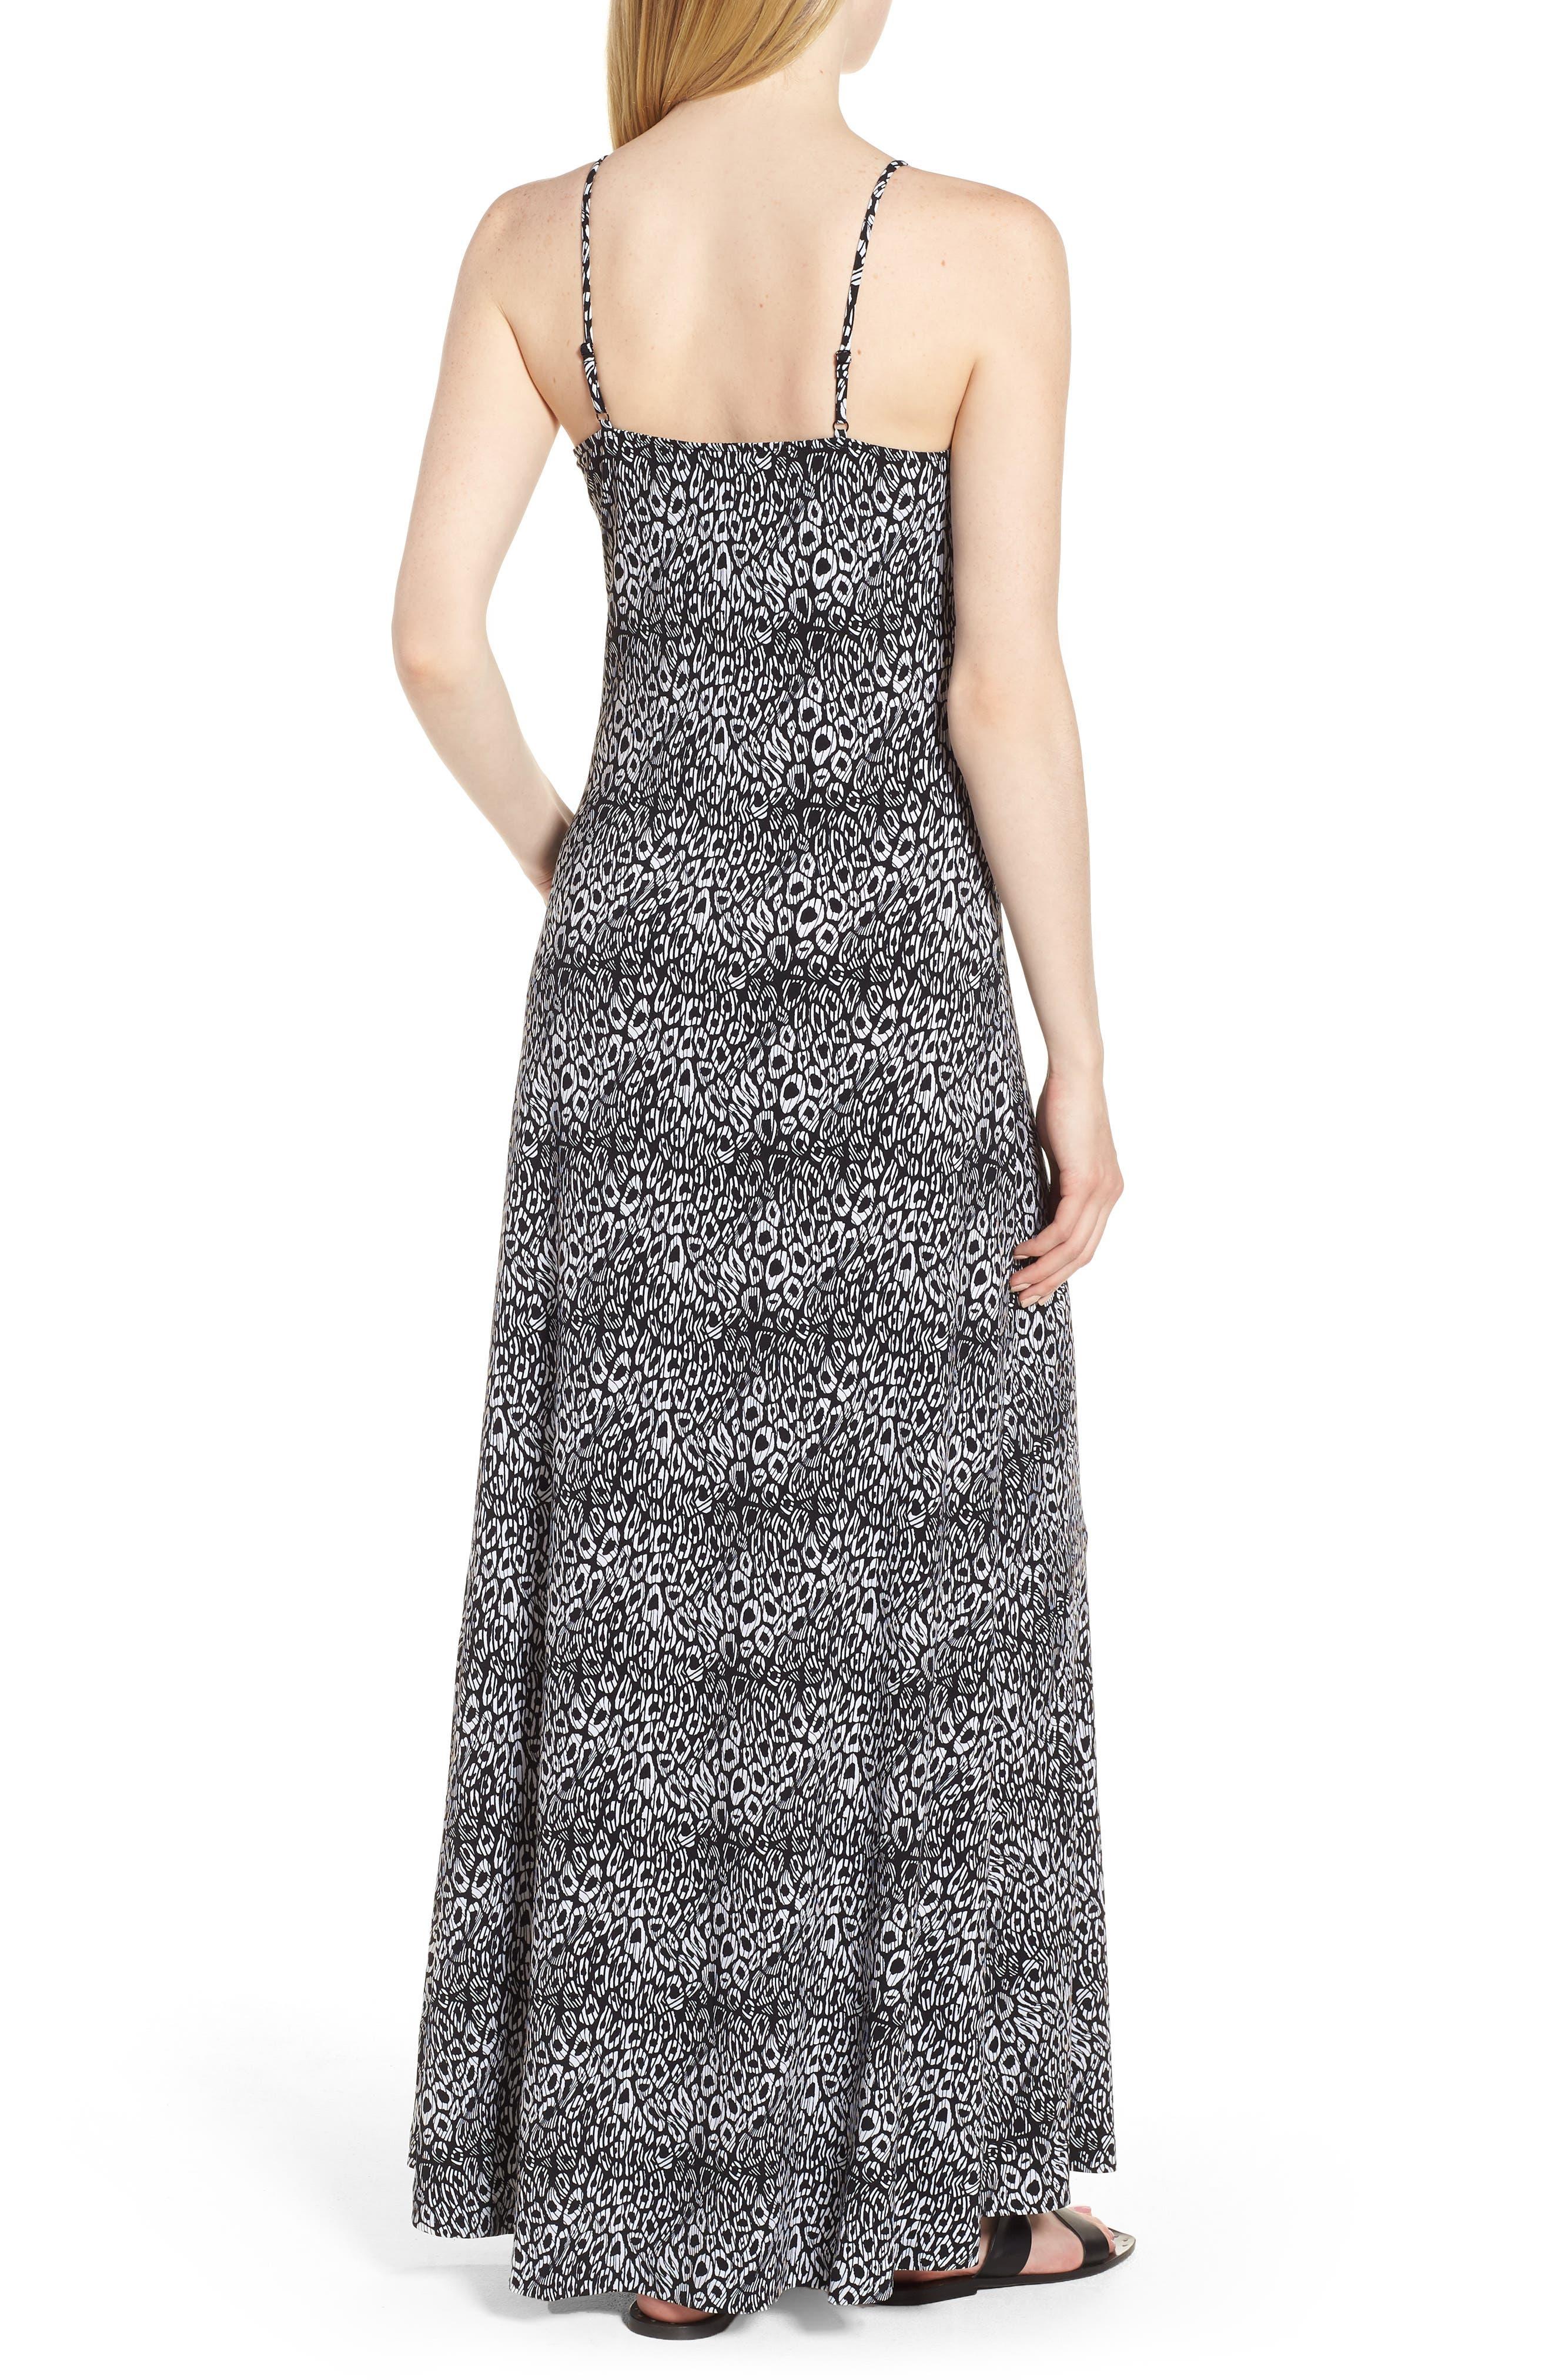 Wavy Leopard Print Tank Maxi Dress,                             Alternate thumbnail 2, color,                             Black/ White